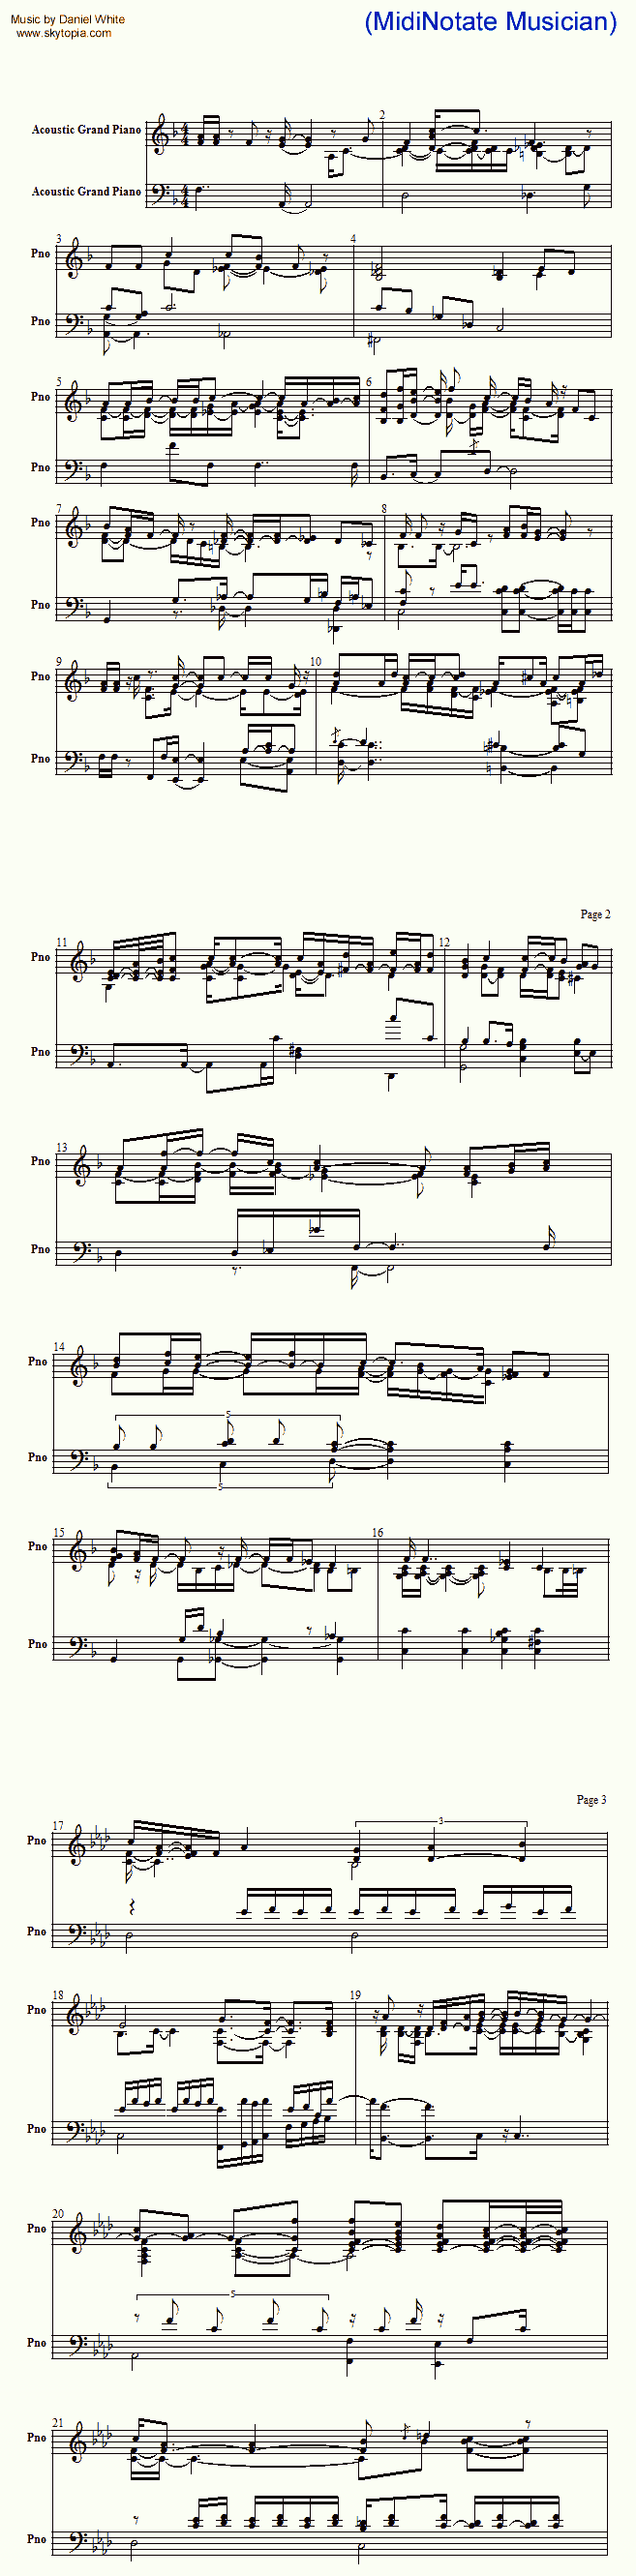 Convert Midi To Sheet Music The Best Notation Converter Software